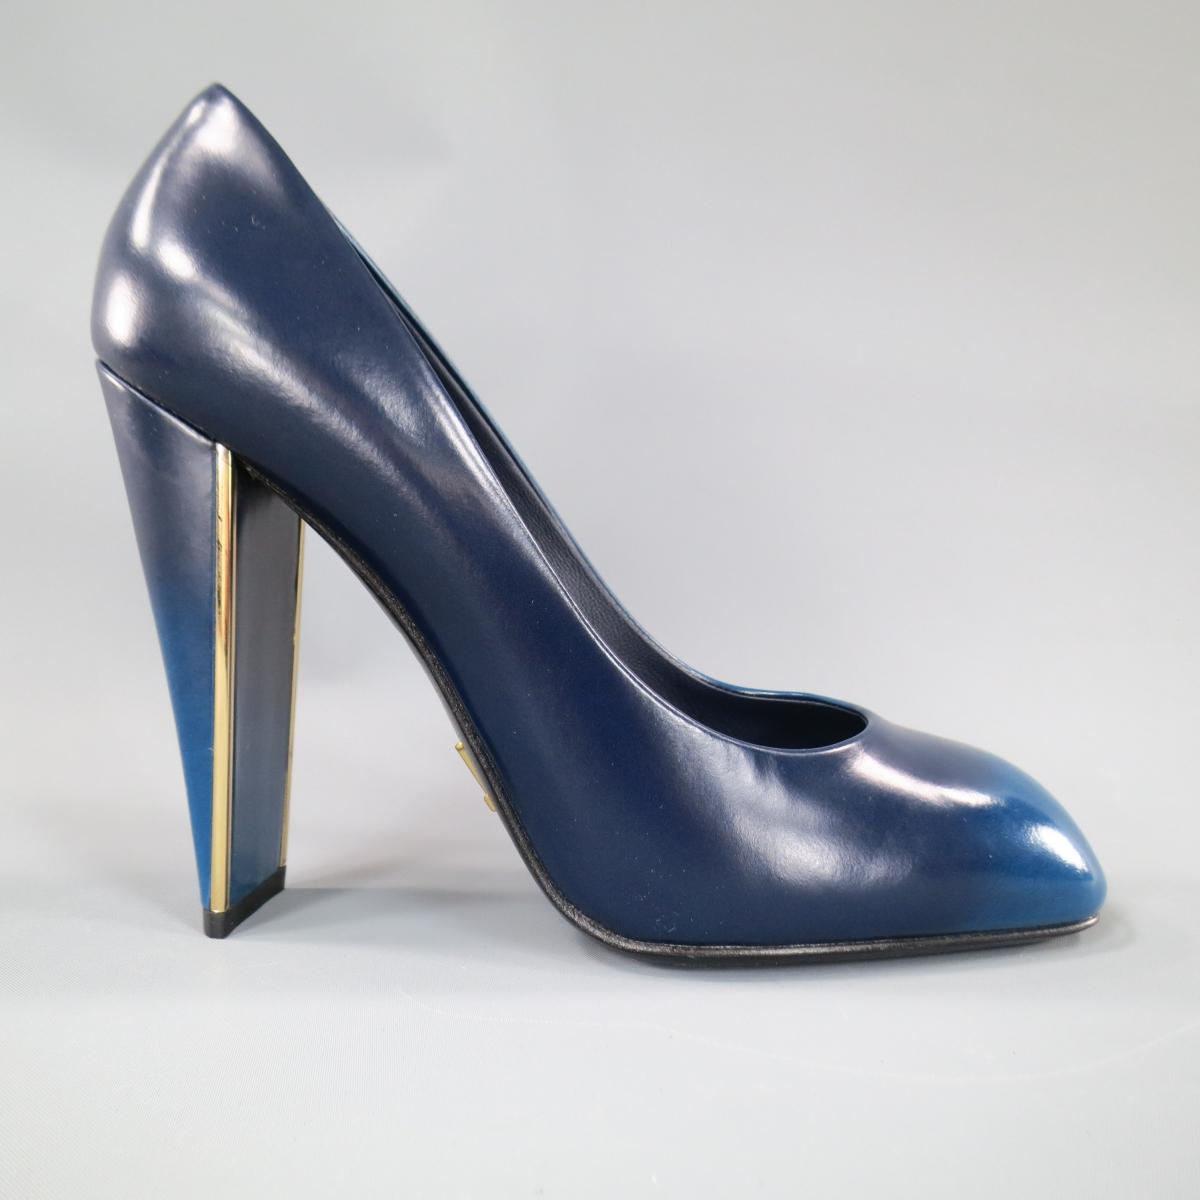 Shop Women's Pumps, Heels, Platforms at Sui Generis Designer ...